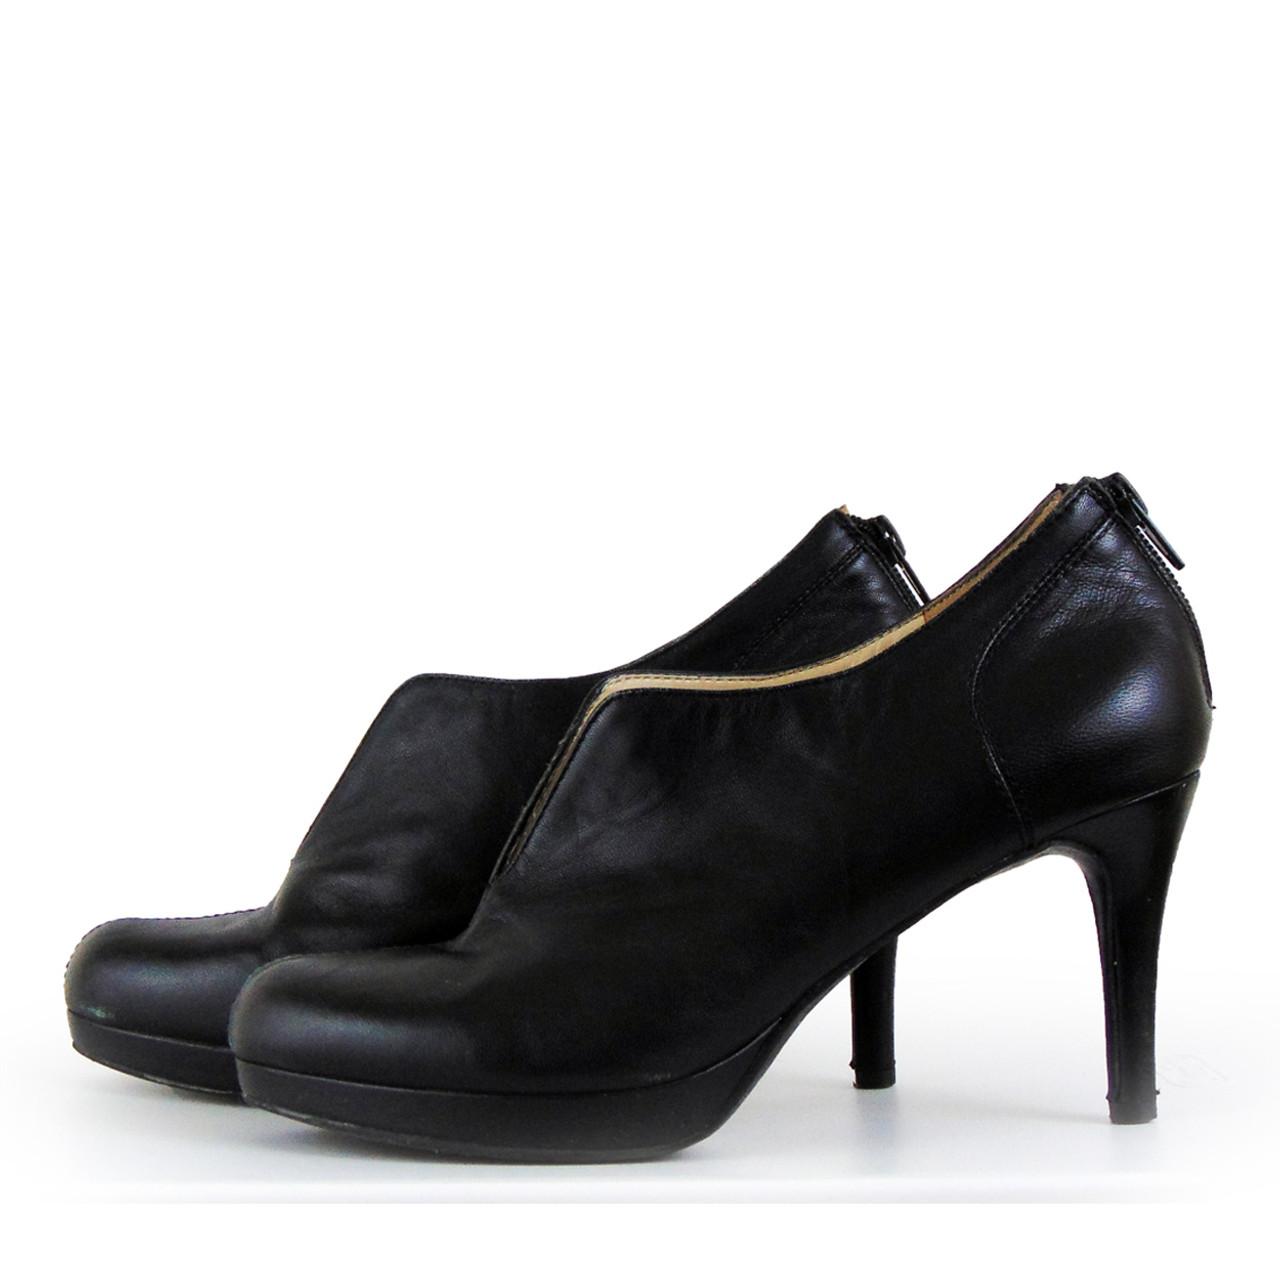 b03e978698d Nine West Black Bootie Shoe Size 6 1 2 M Nice slip on bootie with